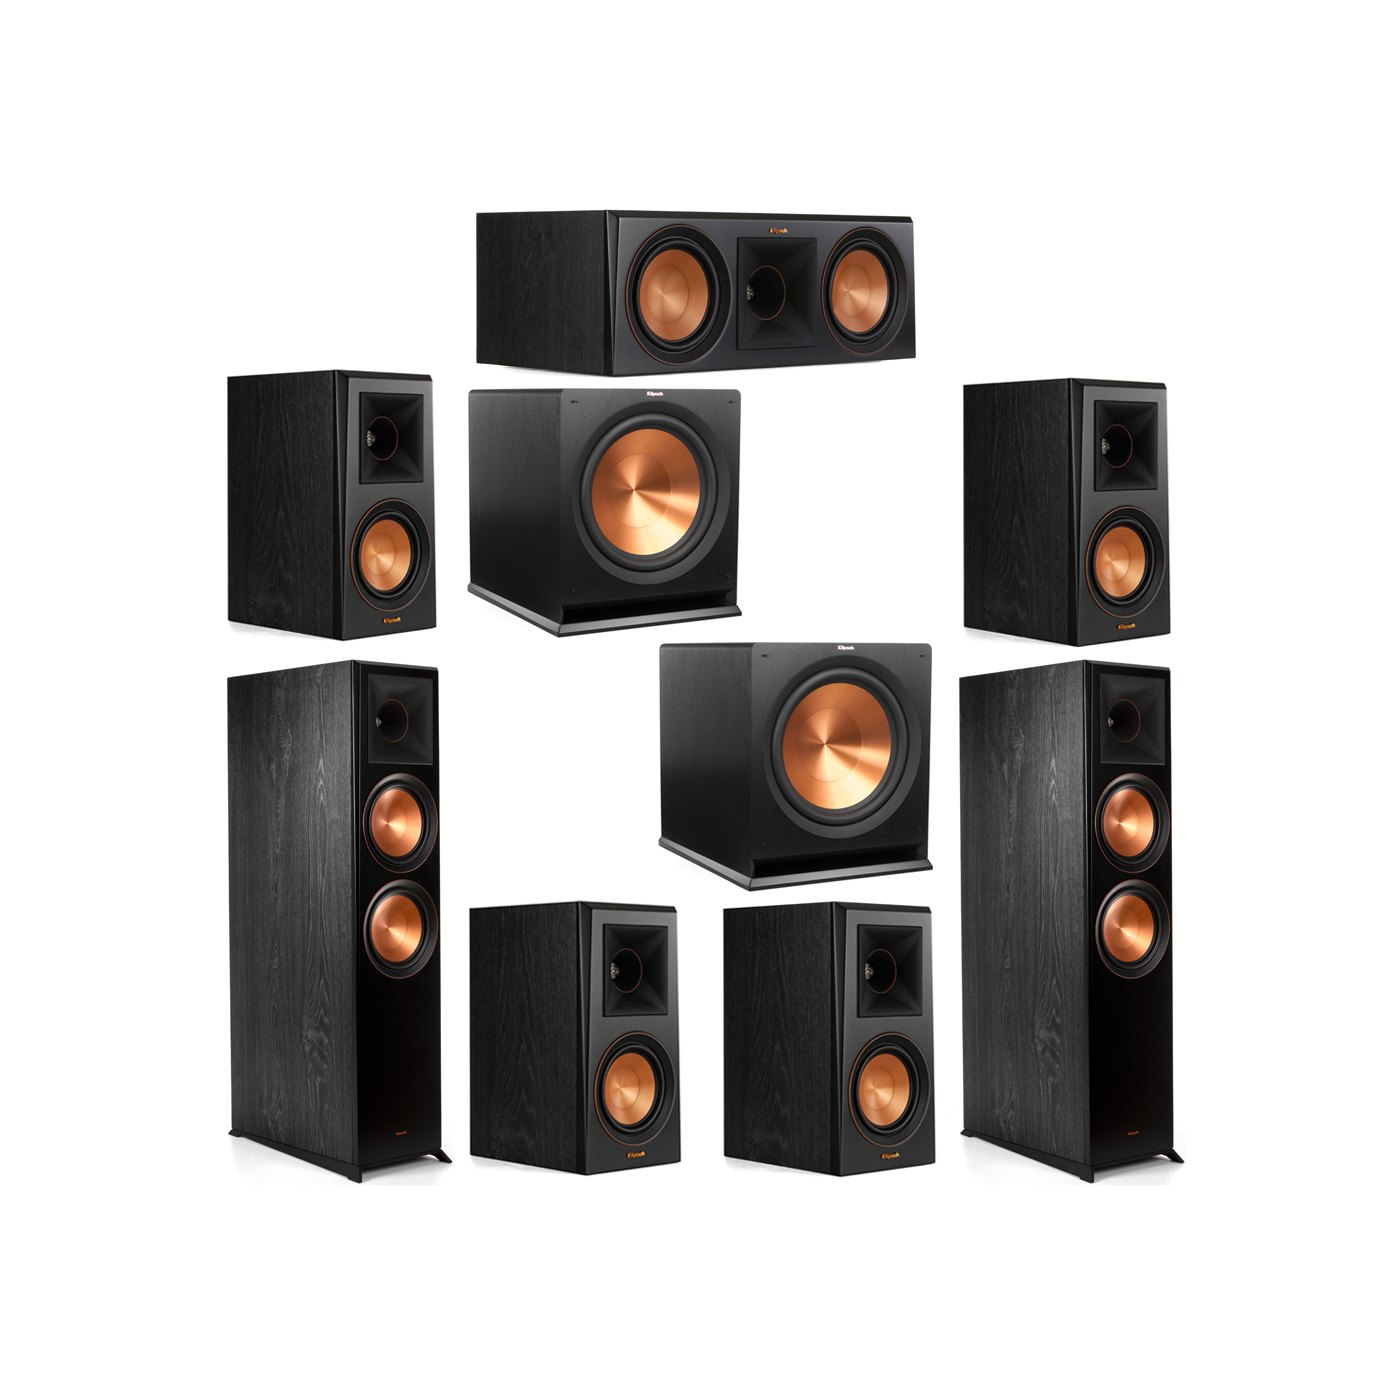 Klipsch 7.2 System with 2 RP-8000F Floorstanding Speakers, 1 Klipsch RP-600C Center Speaker, 4 Klipsch RP-500M Surround Speakers, 2 Klipsch R-115SW Subwoofers